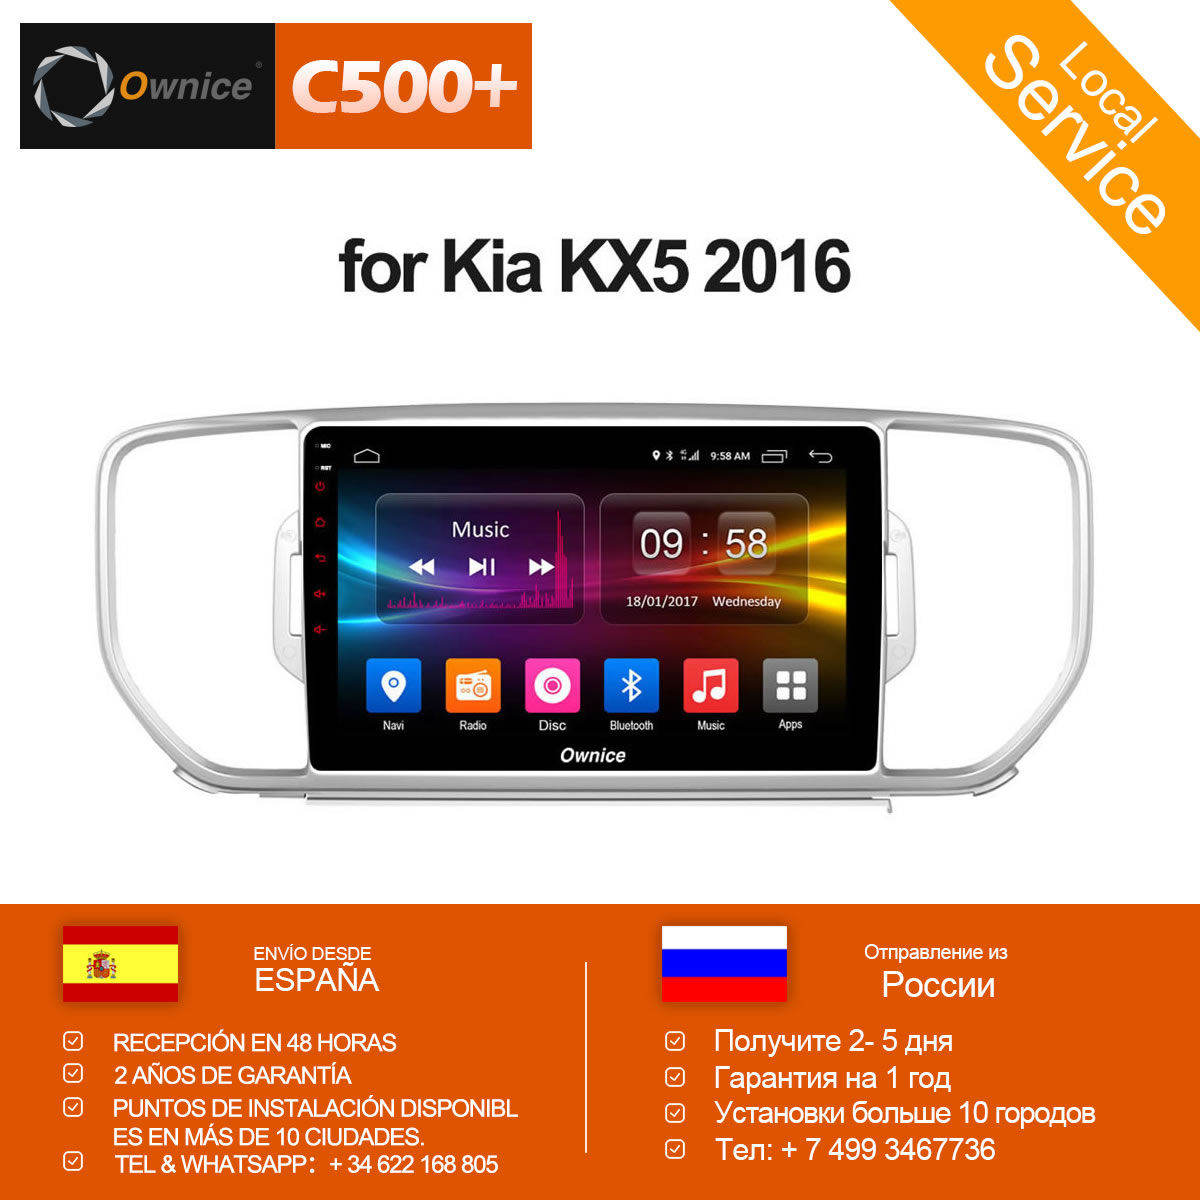 Ownice C500+ G10 Android 8.1 eight Core For KIA Sportage KX5 2016 Car Radio Navi GPS player 2GB RAM 32GB ROM Support 4G DVD ownice c500 android 6 0 octa 8 core car dvd player for suzuki grand vitara android 6 0 wifi 4g gps bt radio 2gb ram 32gb rom